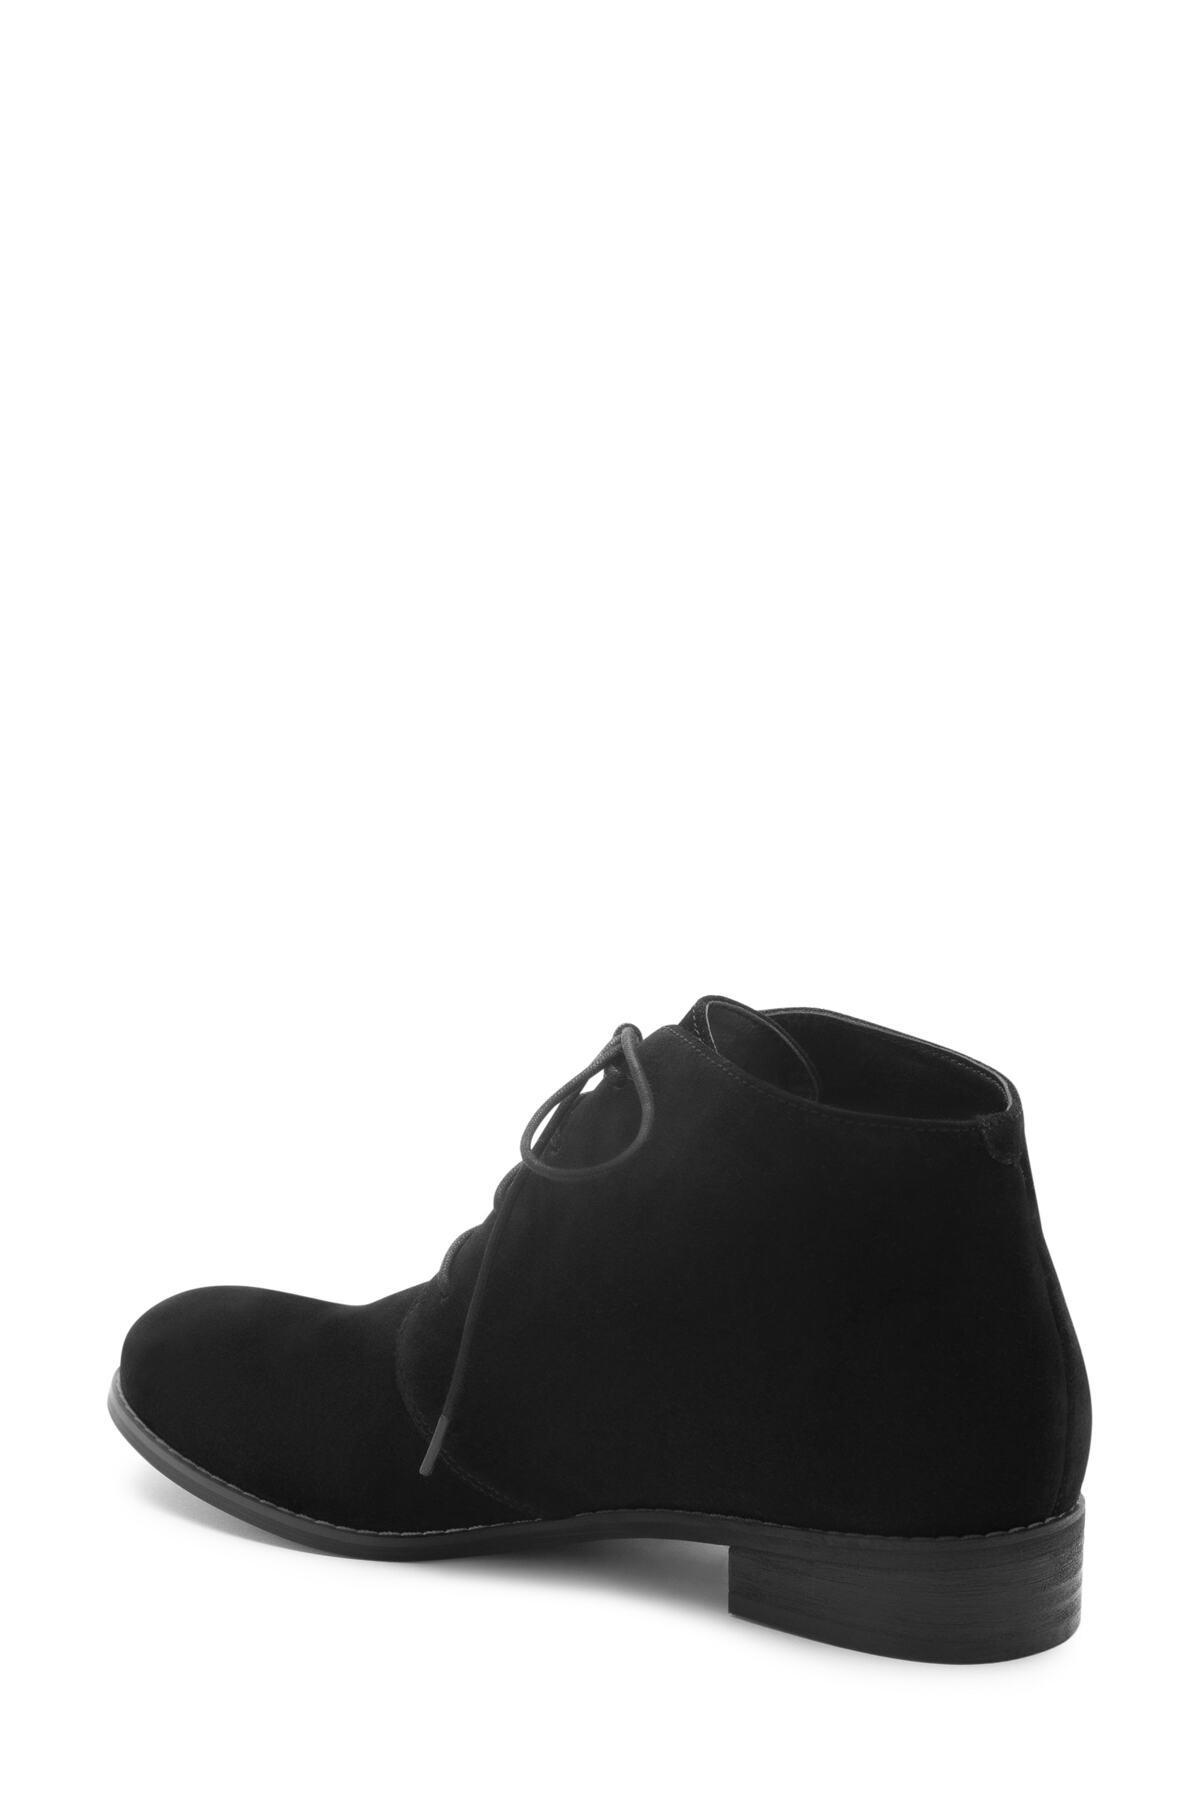 Blondo Rayann Waterproof Desert Boot